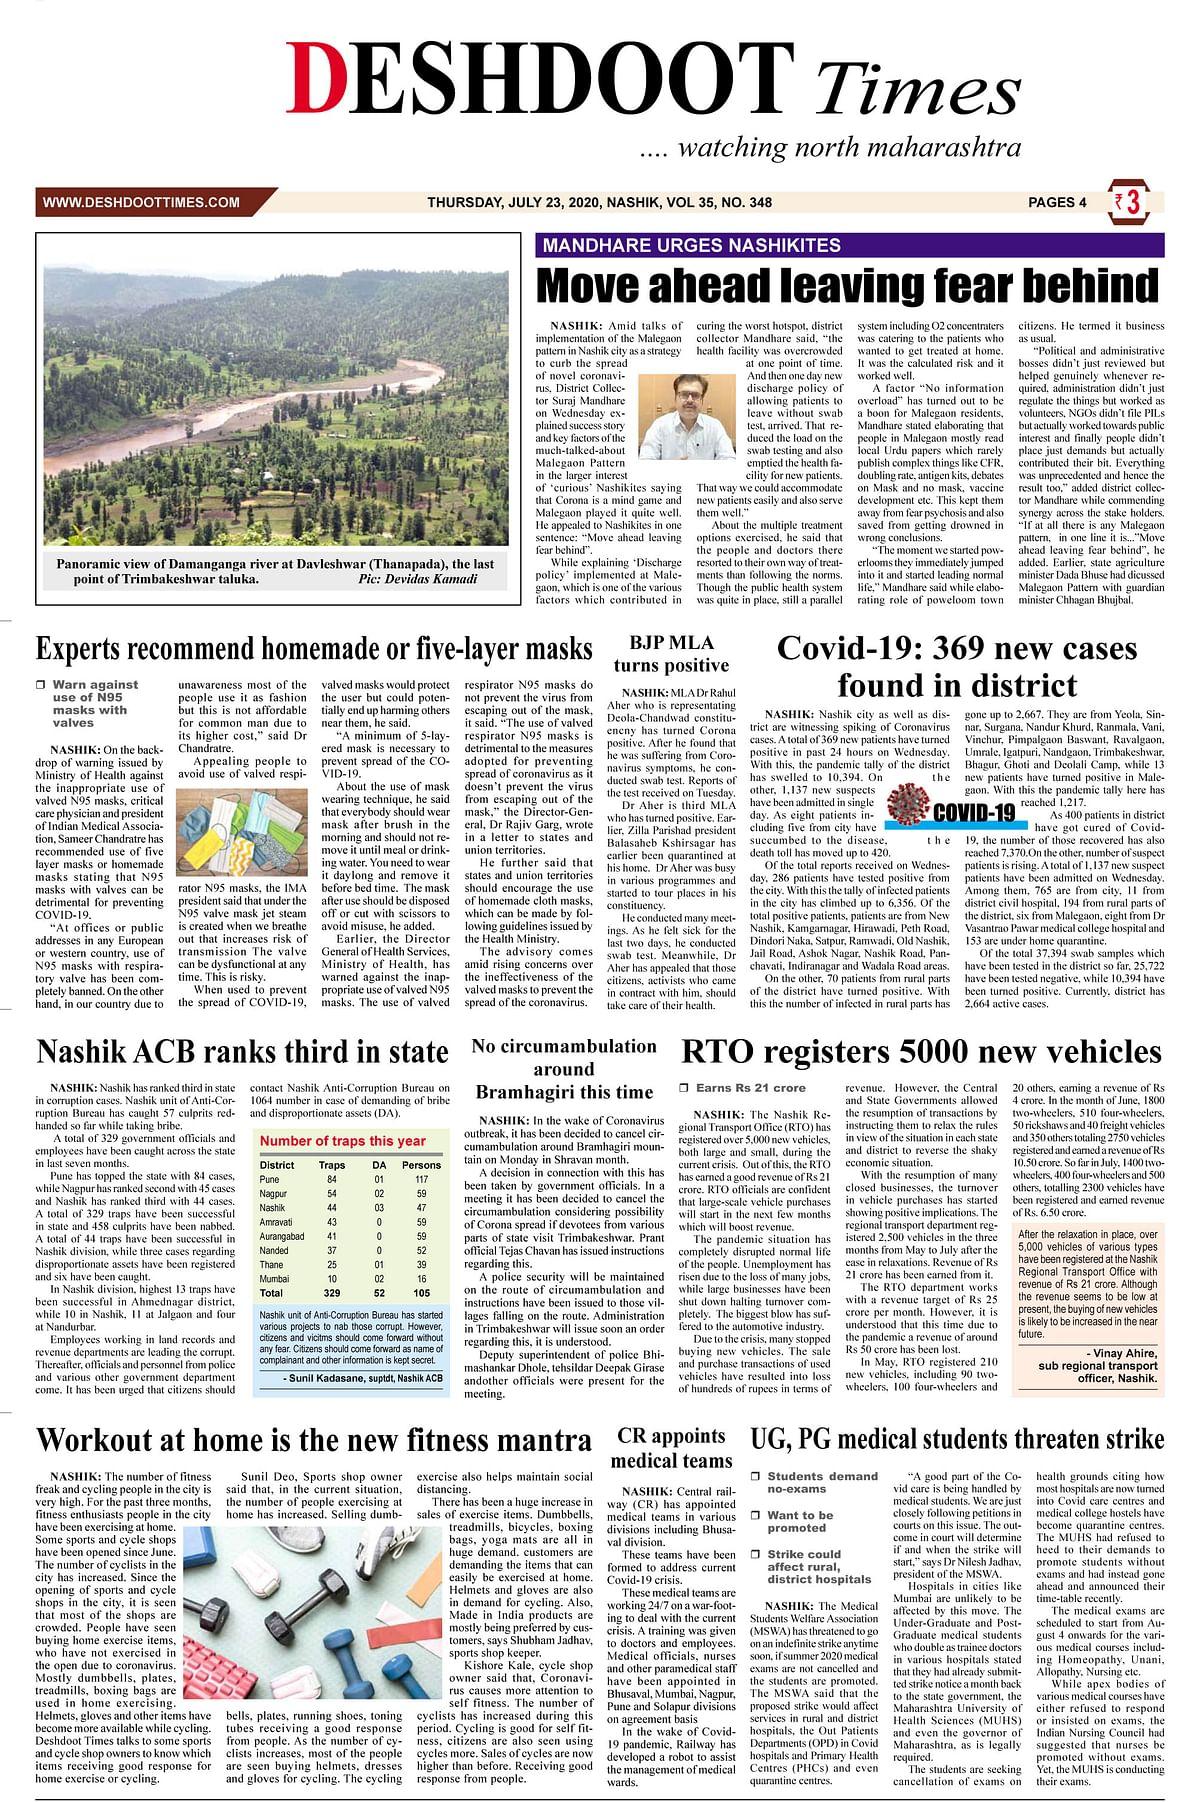 Deshdoot Times E Paper, 23 July 2020